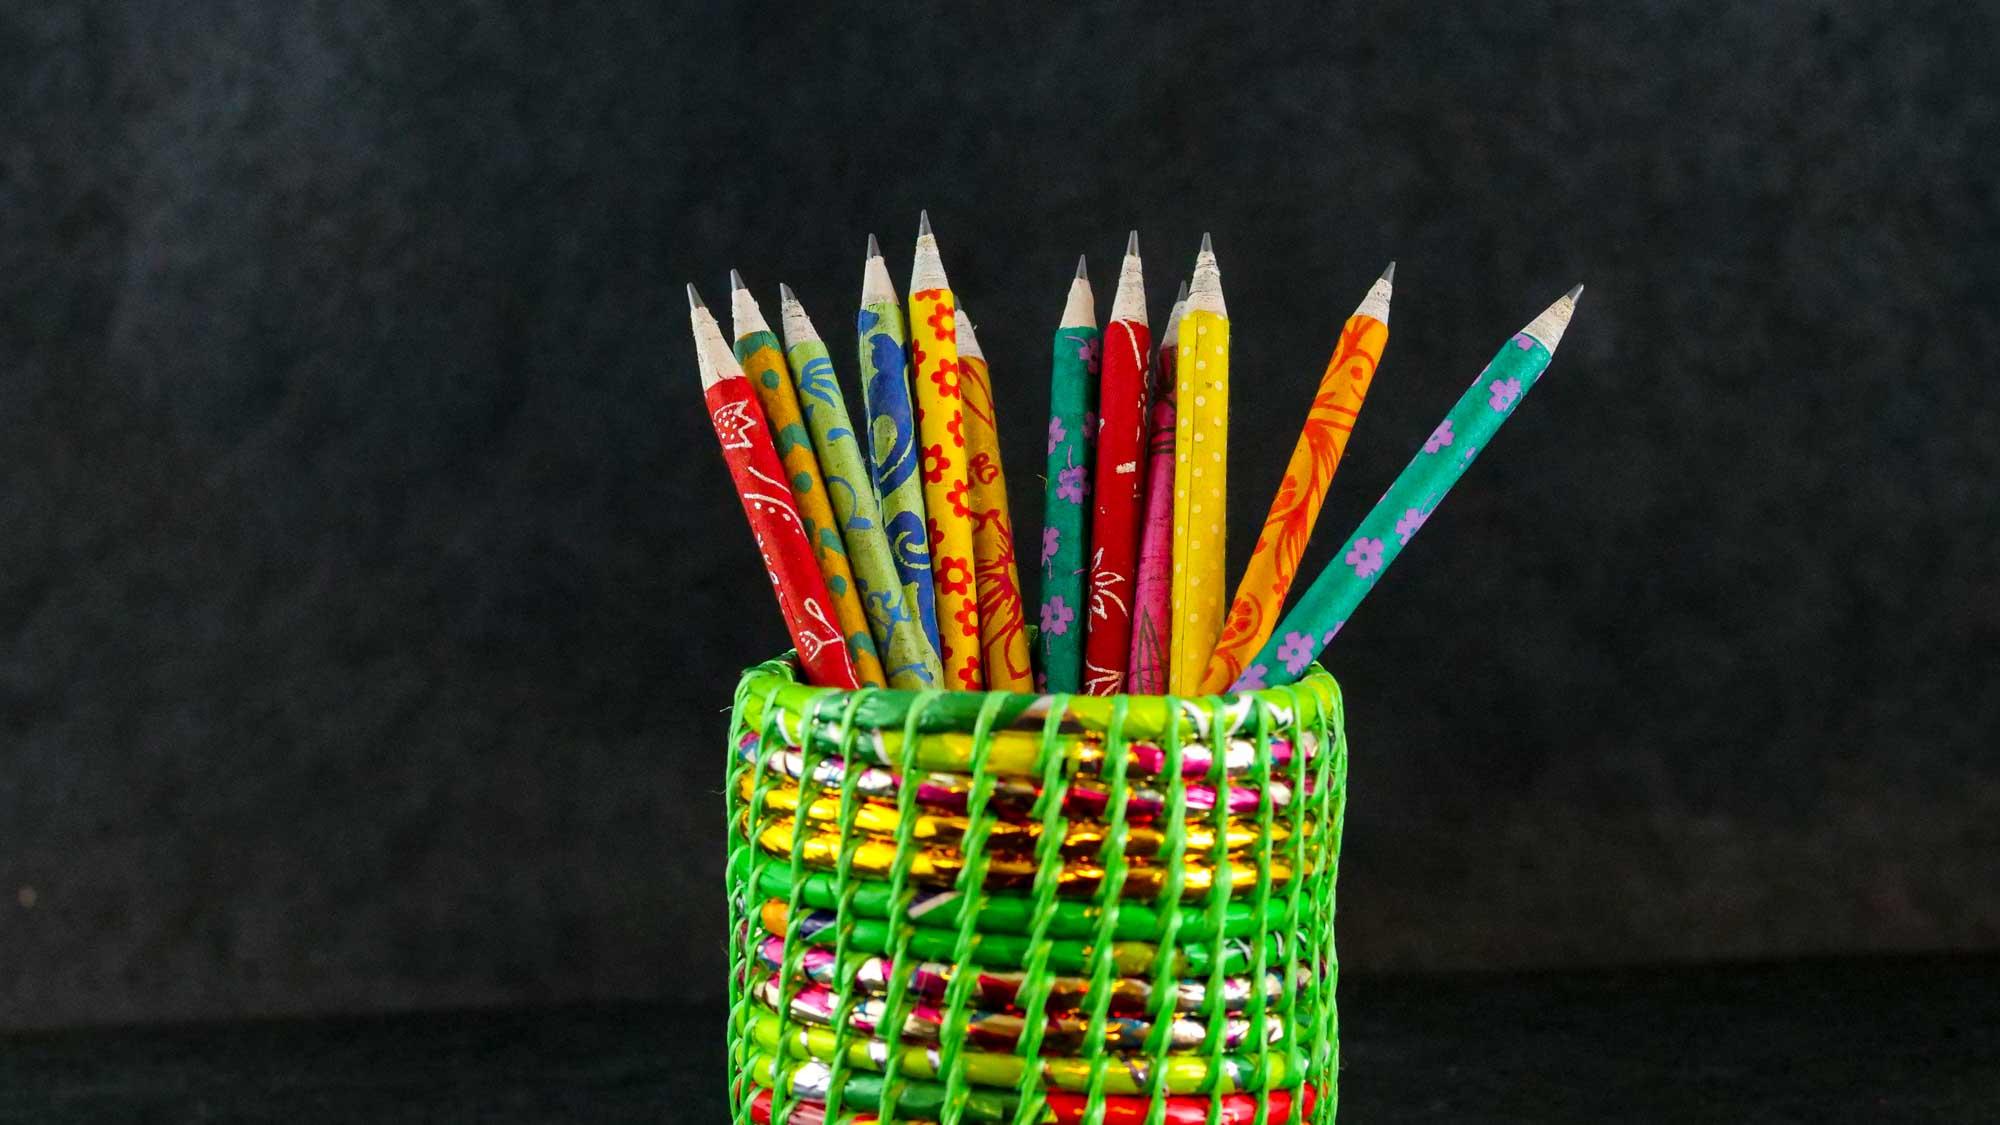 Bleistifte 'Bunt' 10er set